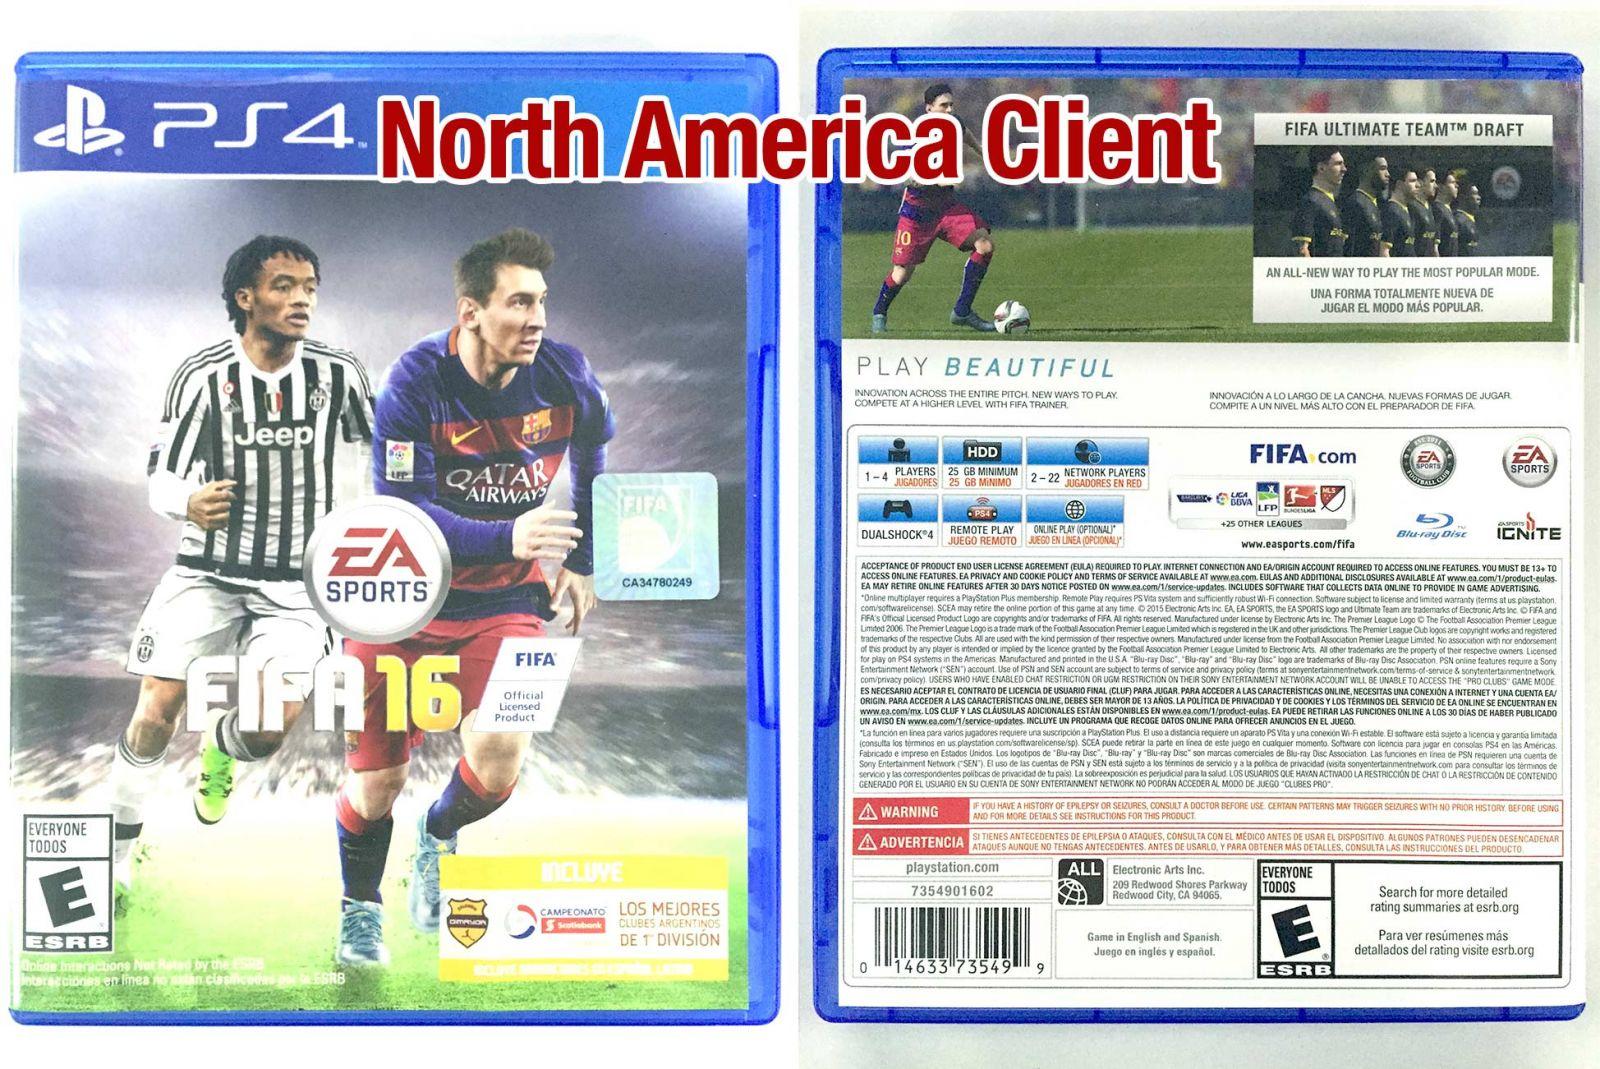 North America Client